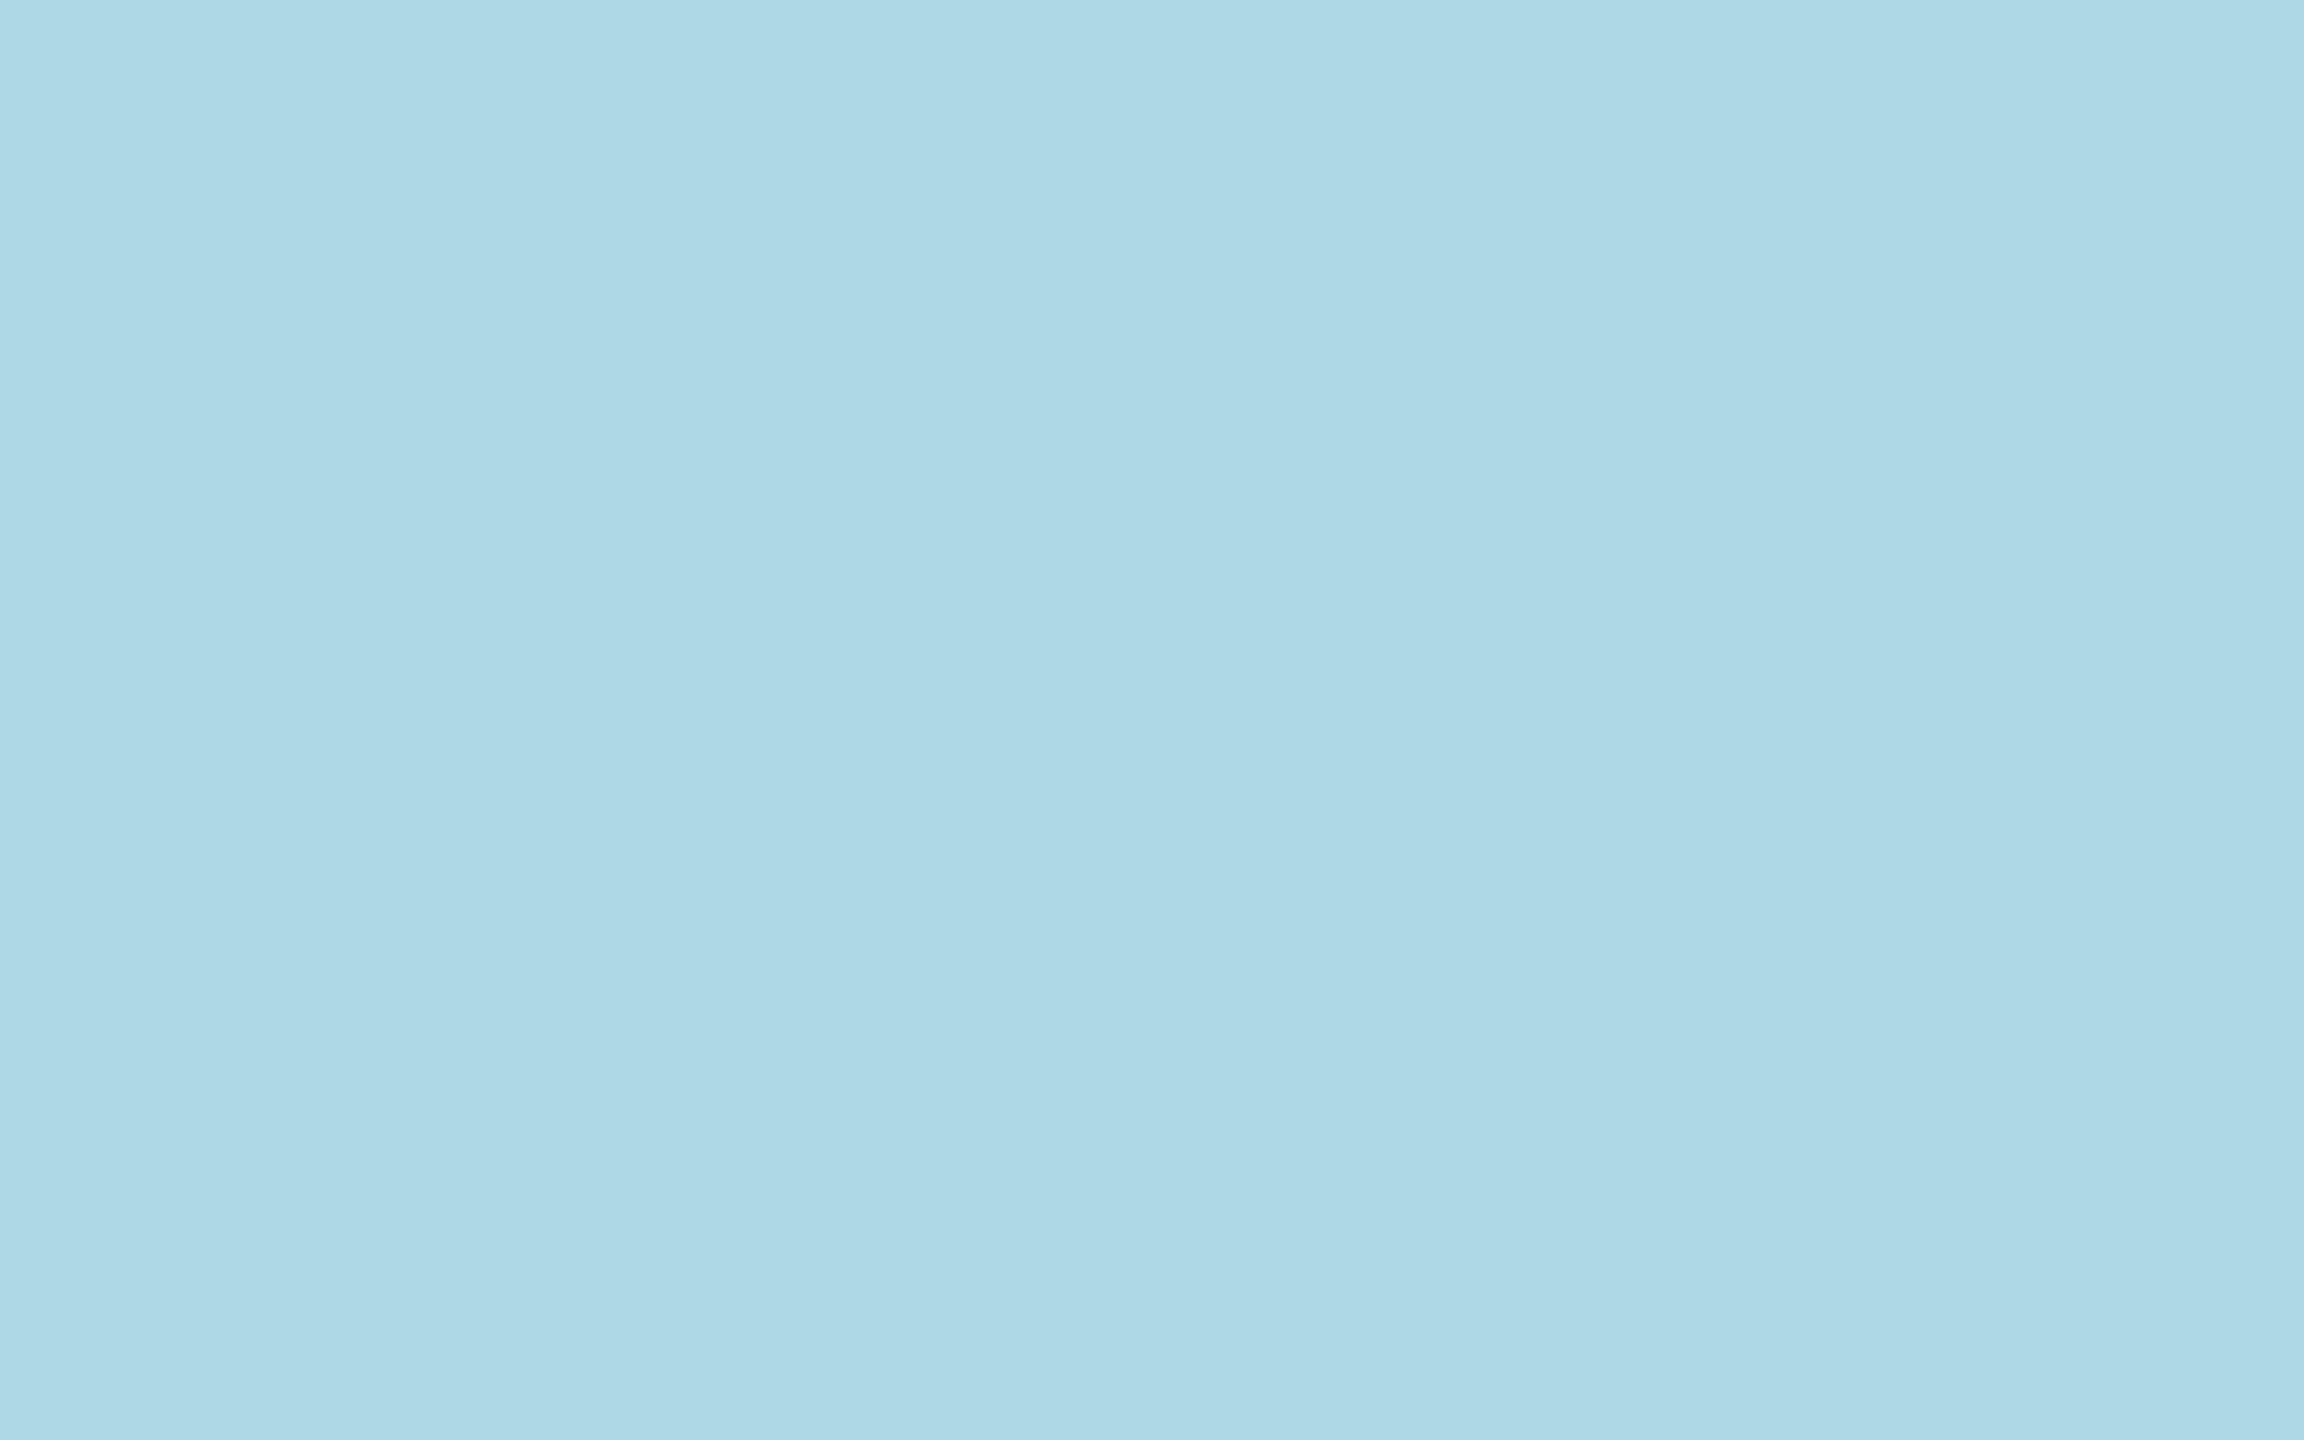 2304x1440 Light Blue Solid Color Background